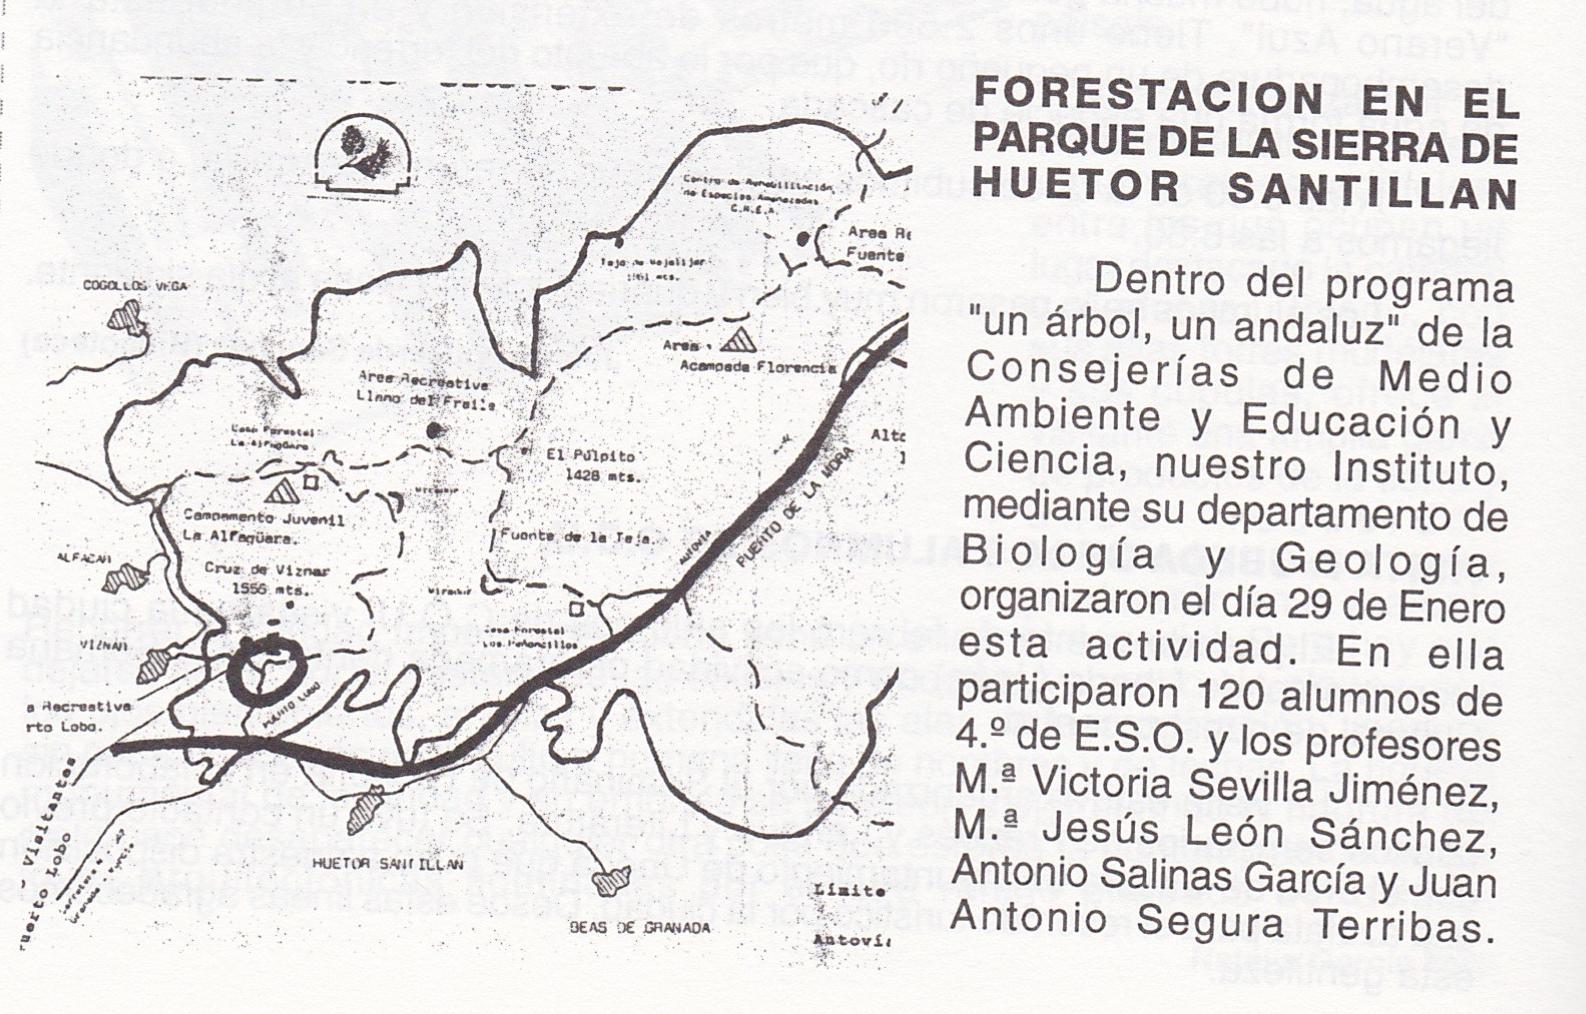 Forestacion1